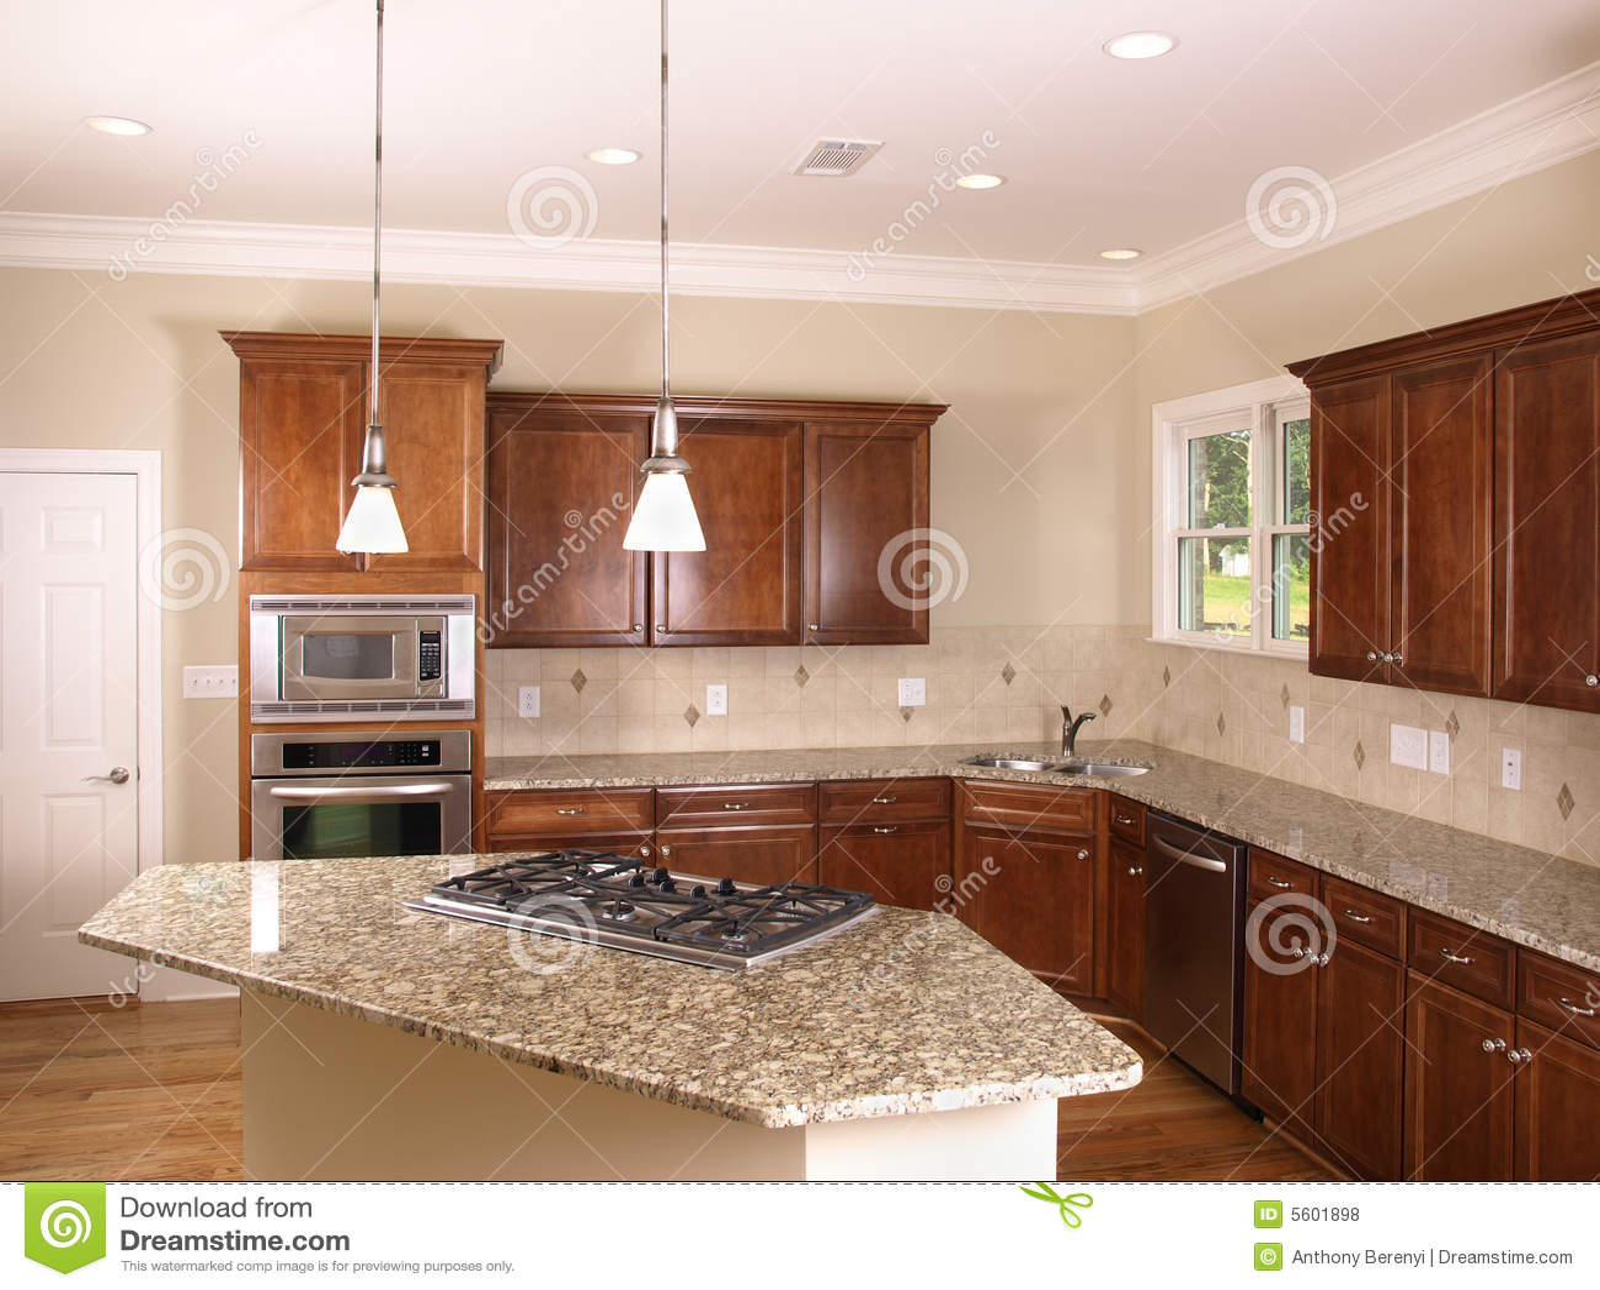 Luxury Kitchen With Island Stove 2 Stock Photo Image Of Design